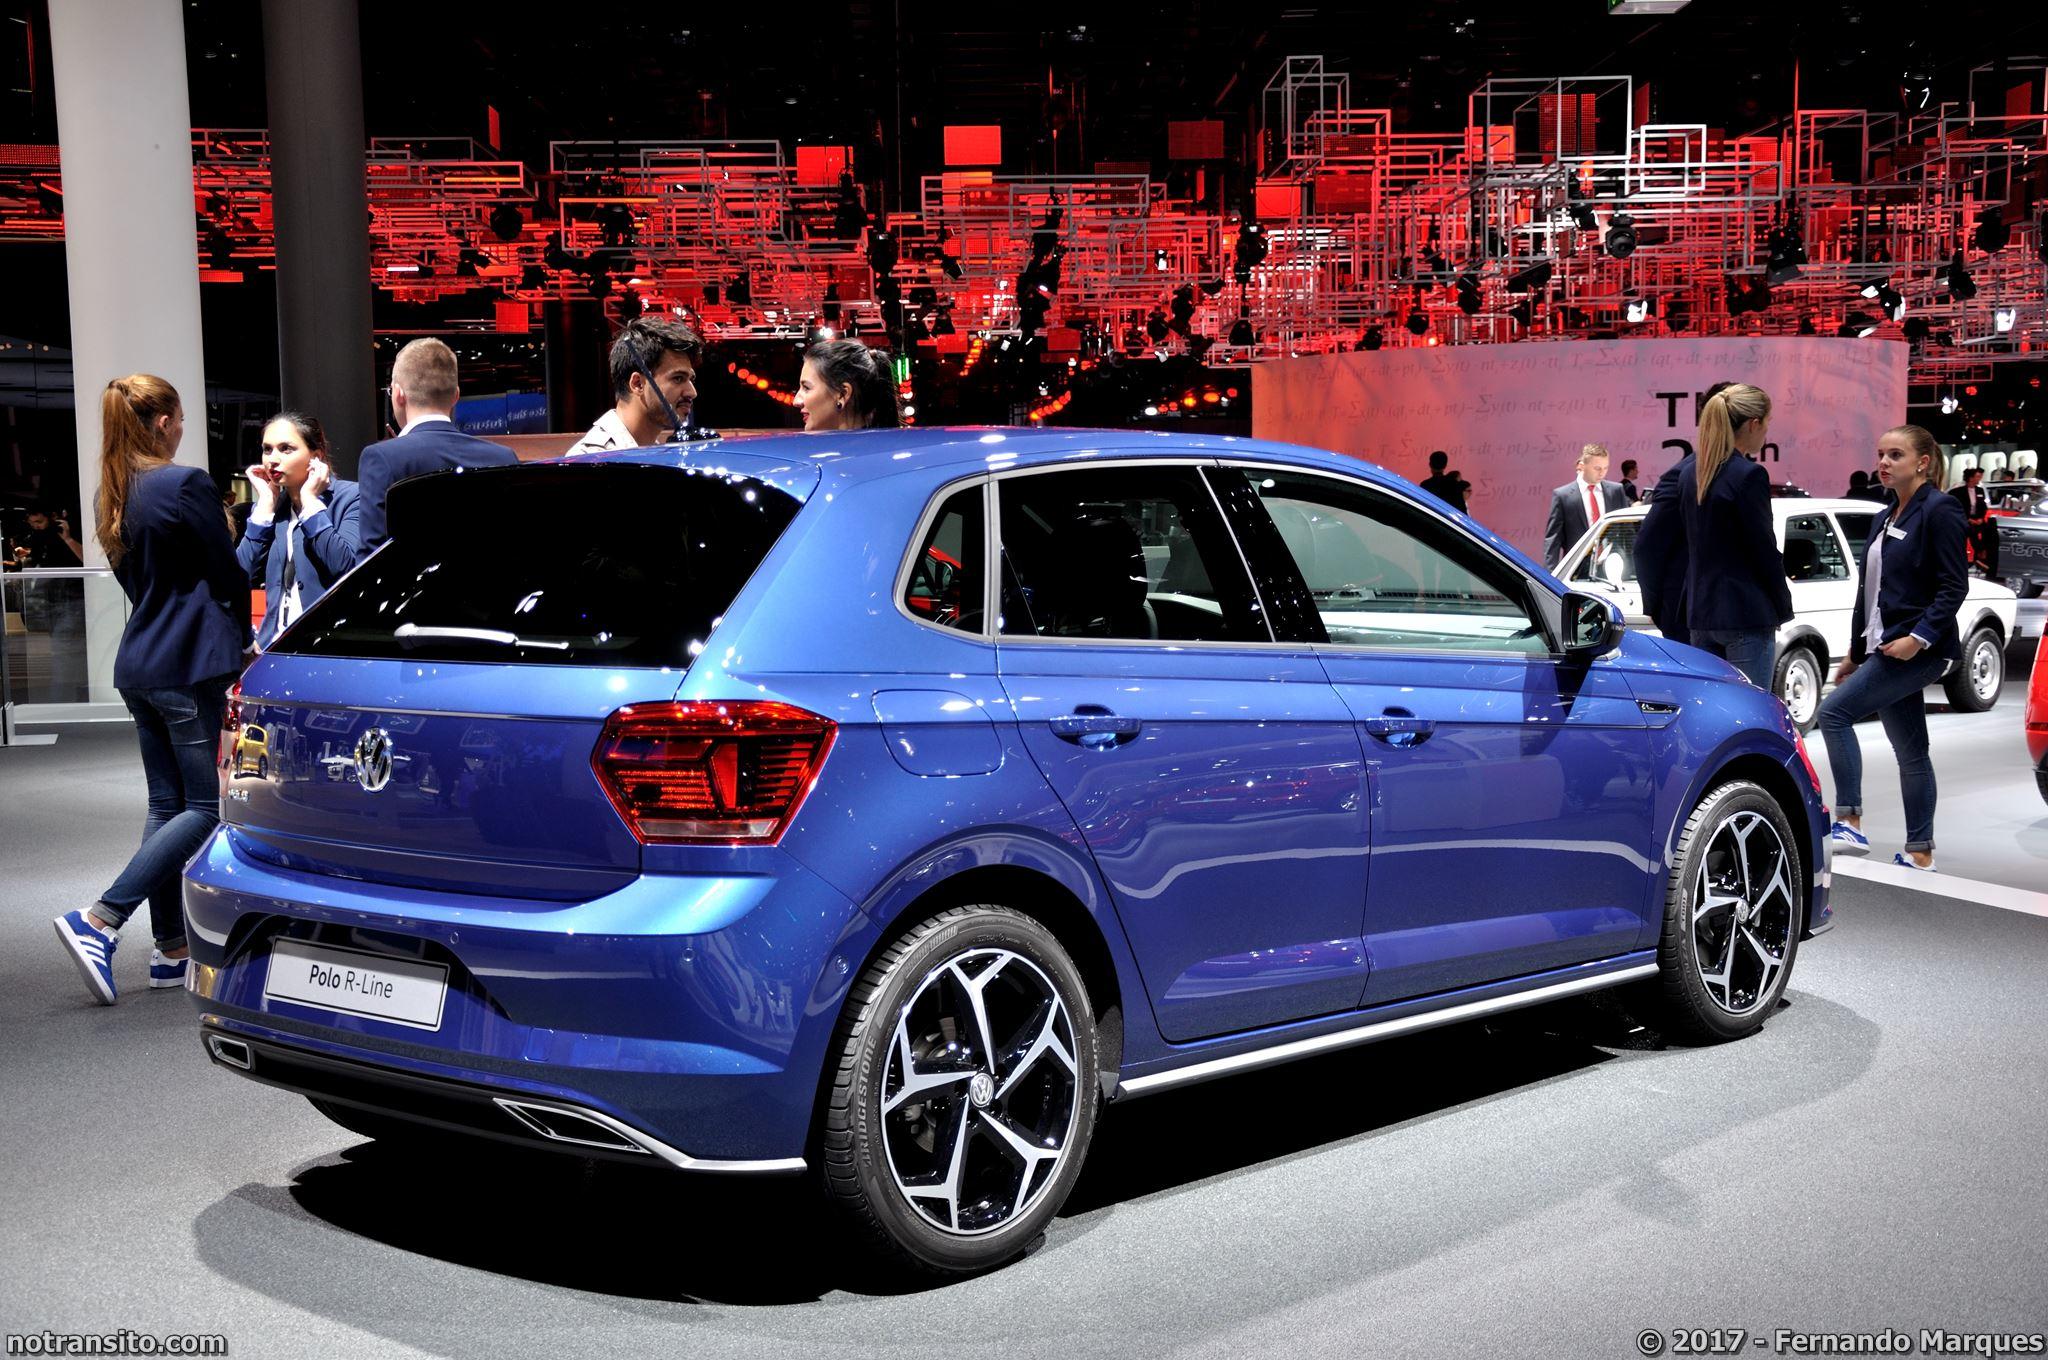 Volkswagen-Polo-GTI-Frankfurt-2017-002